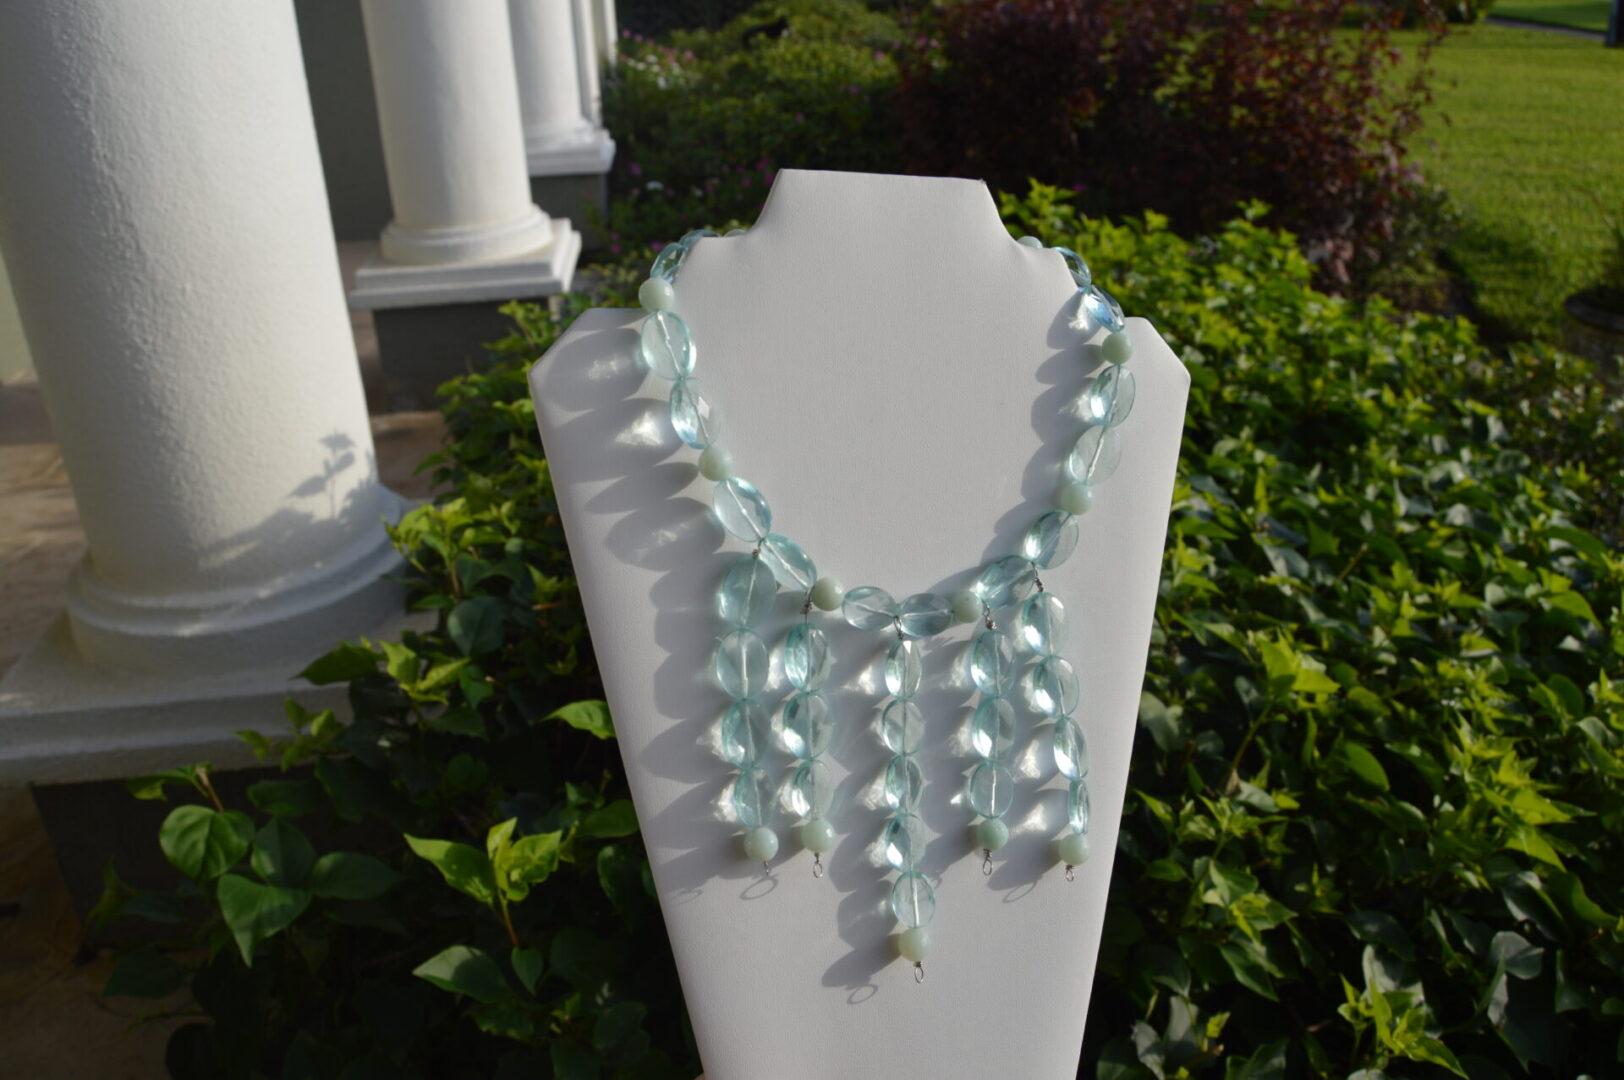 A Blue Diva necklace